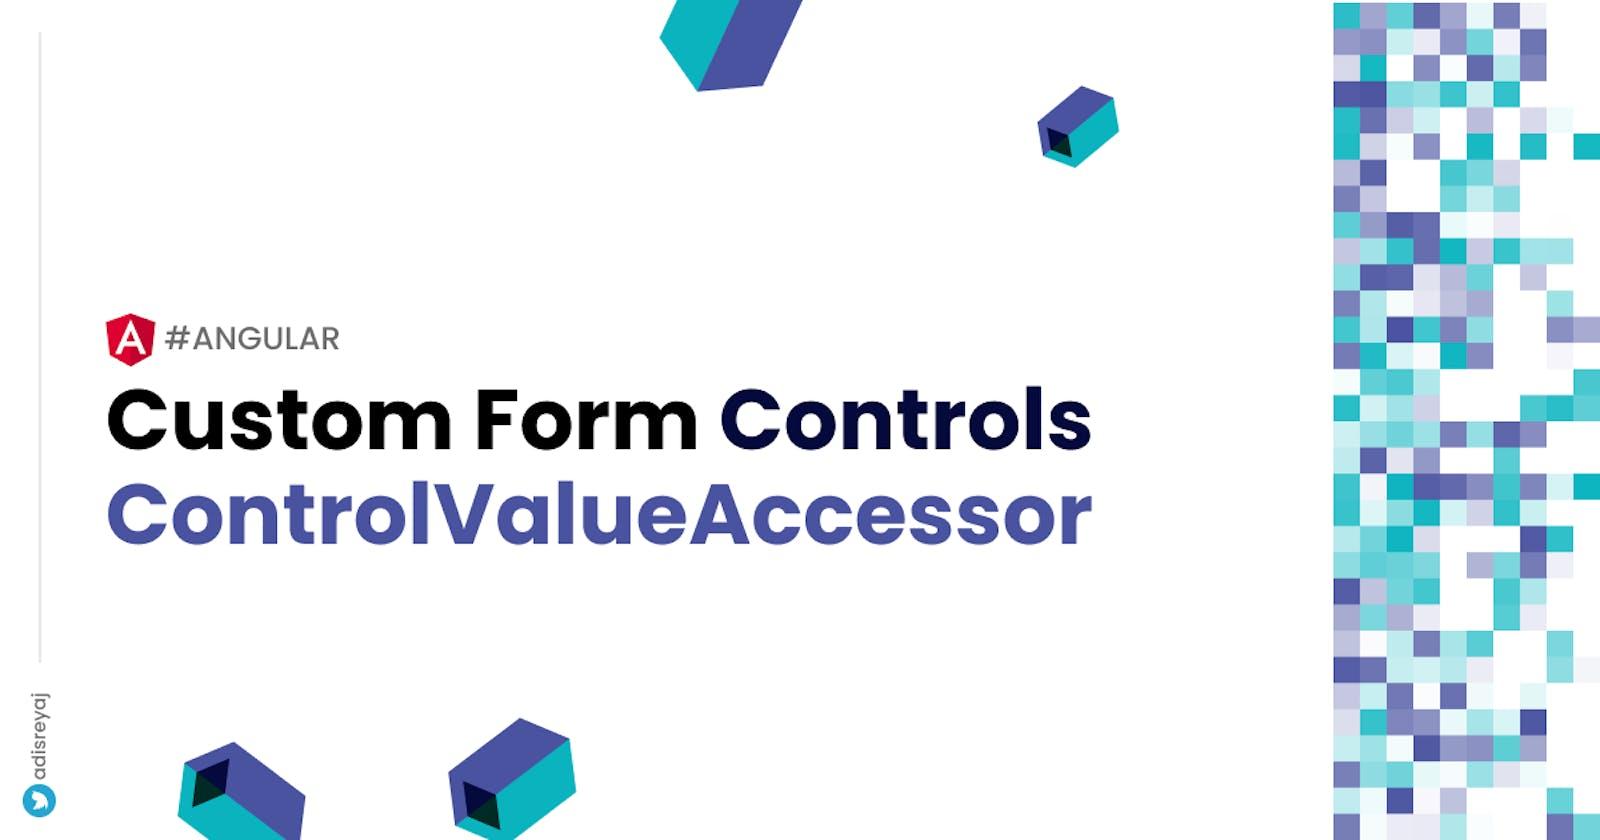 Creating custom form controls using Control Value Accessor in Angular